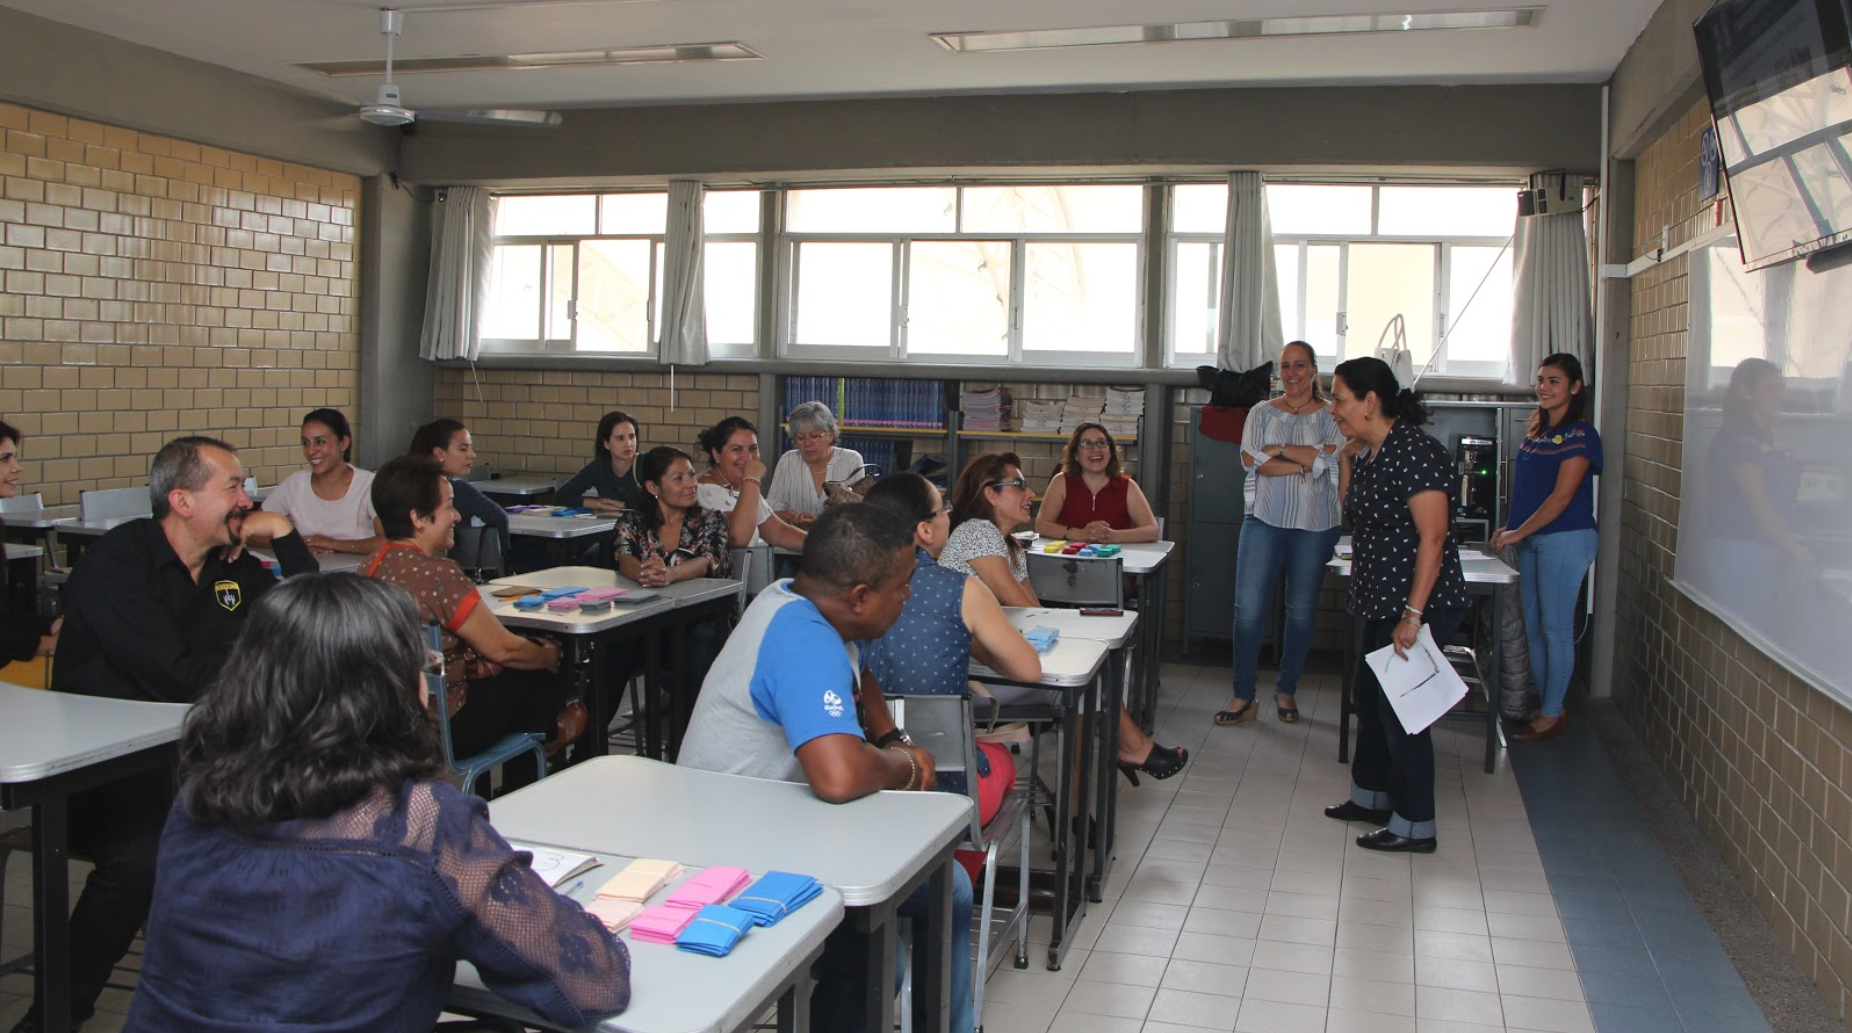 Feria de experiencias pedagógicas significativas (FEPS) del Instituto Lux